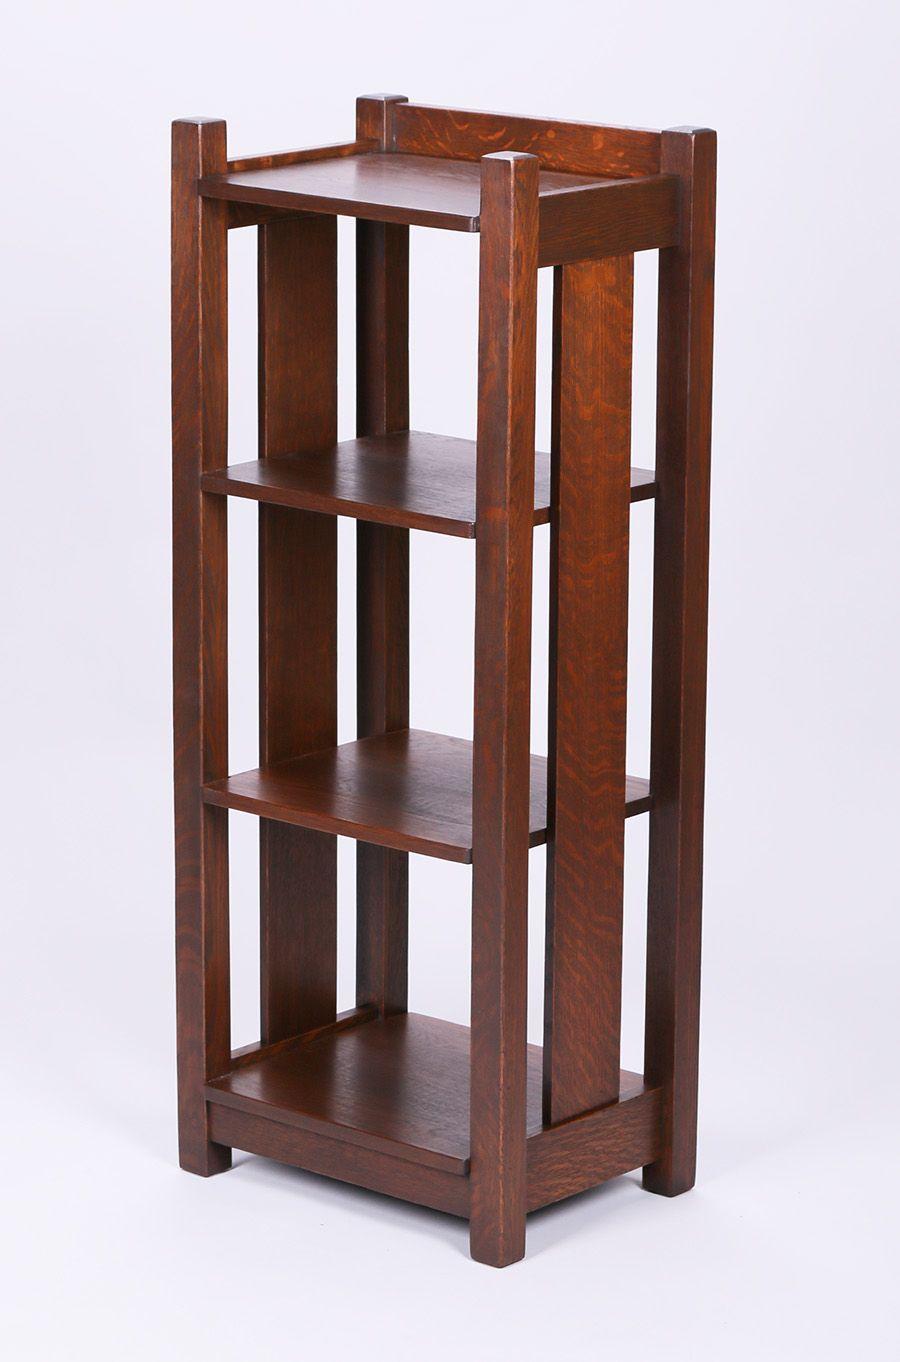 Lifetime Furniture Co Magazine Stand 207 Furniture Magazine Stand Art Furniture